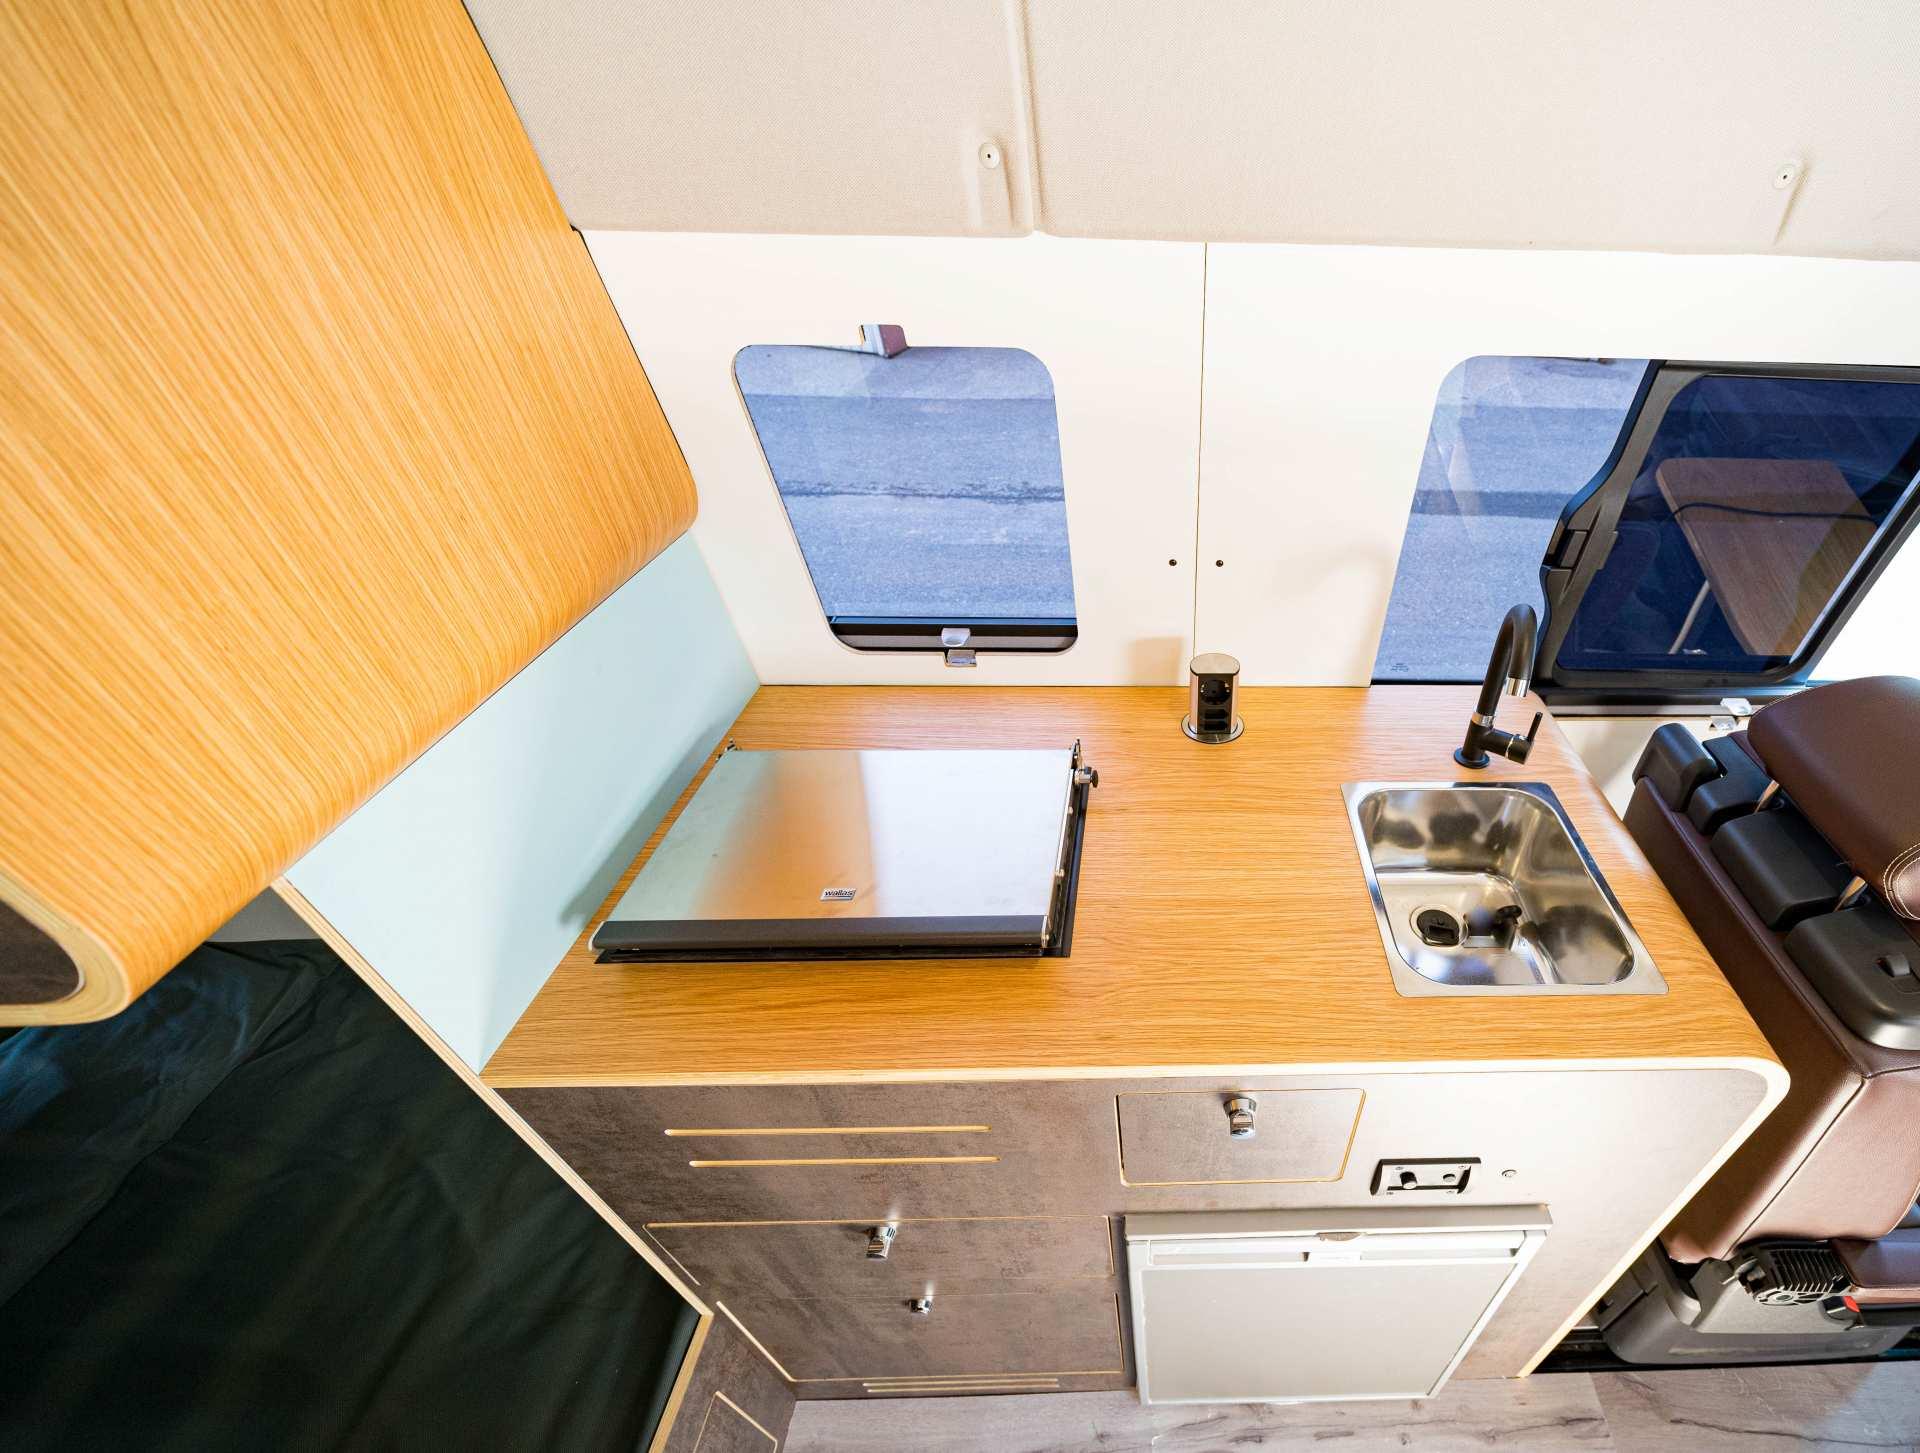 Individualausbau: Full House VW Crafter - 9